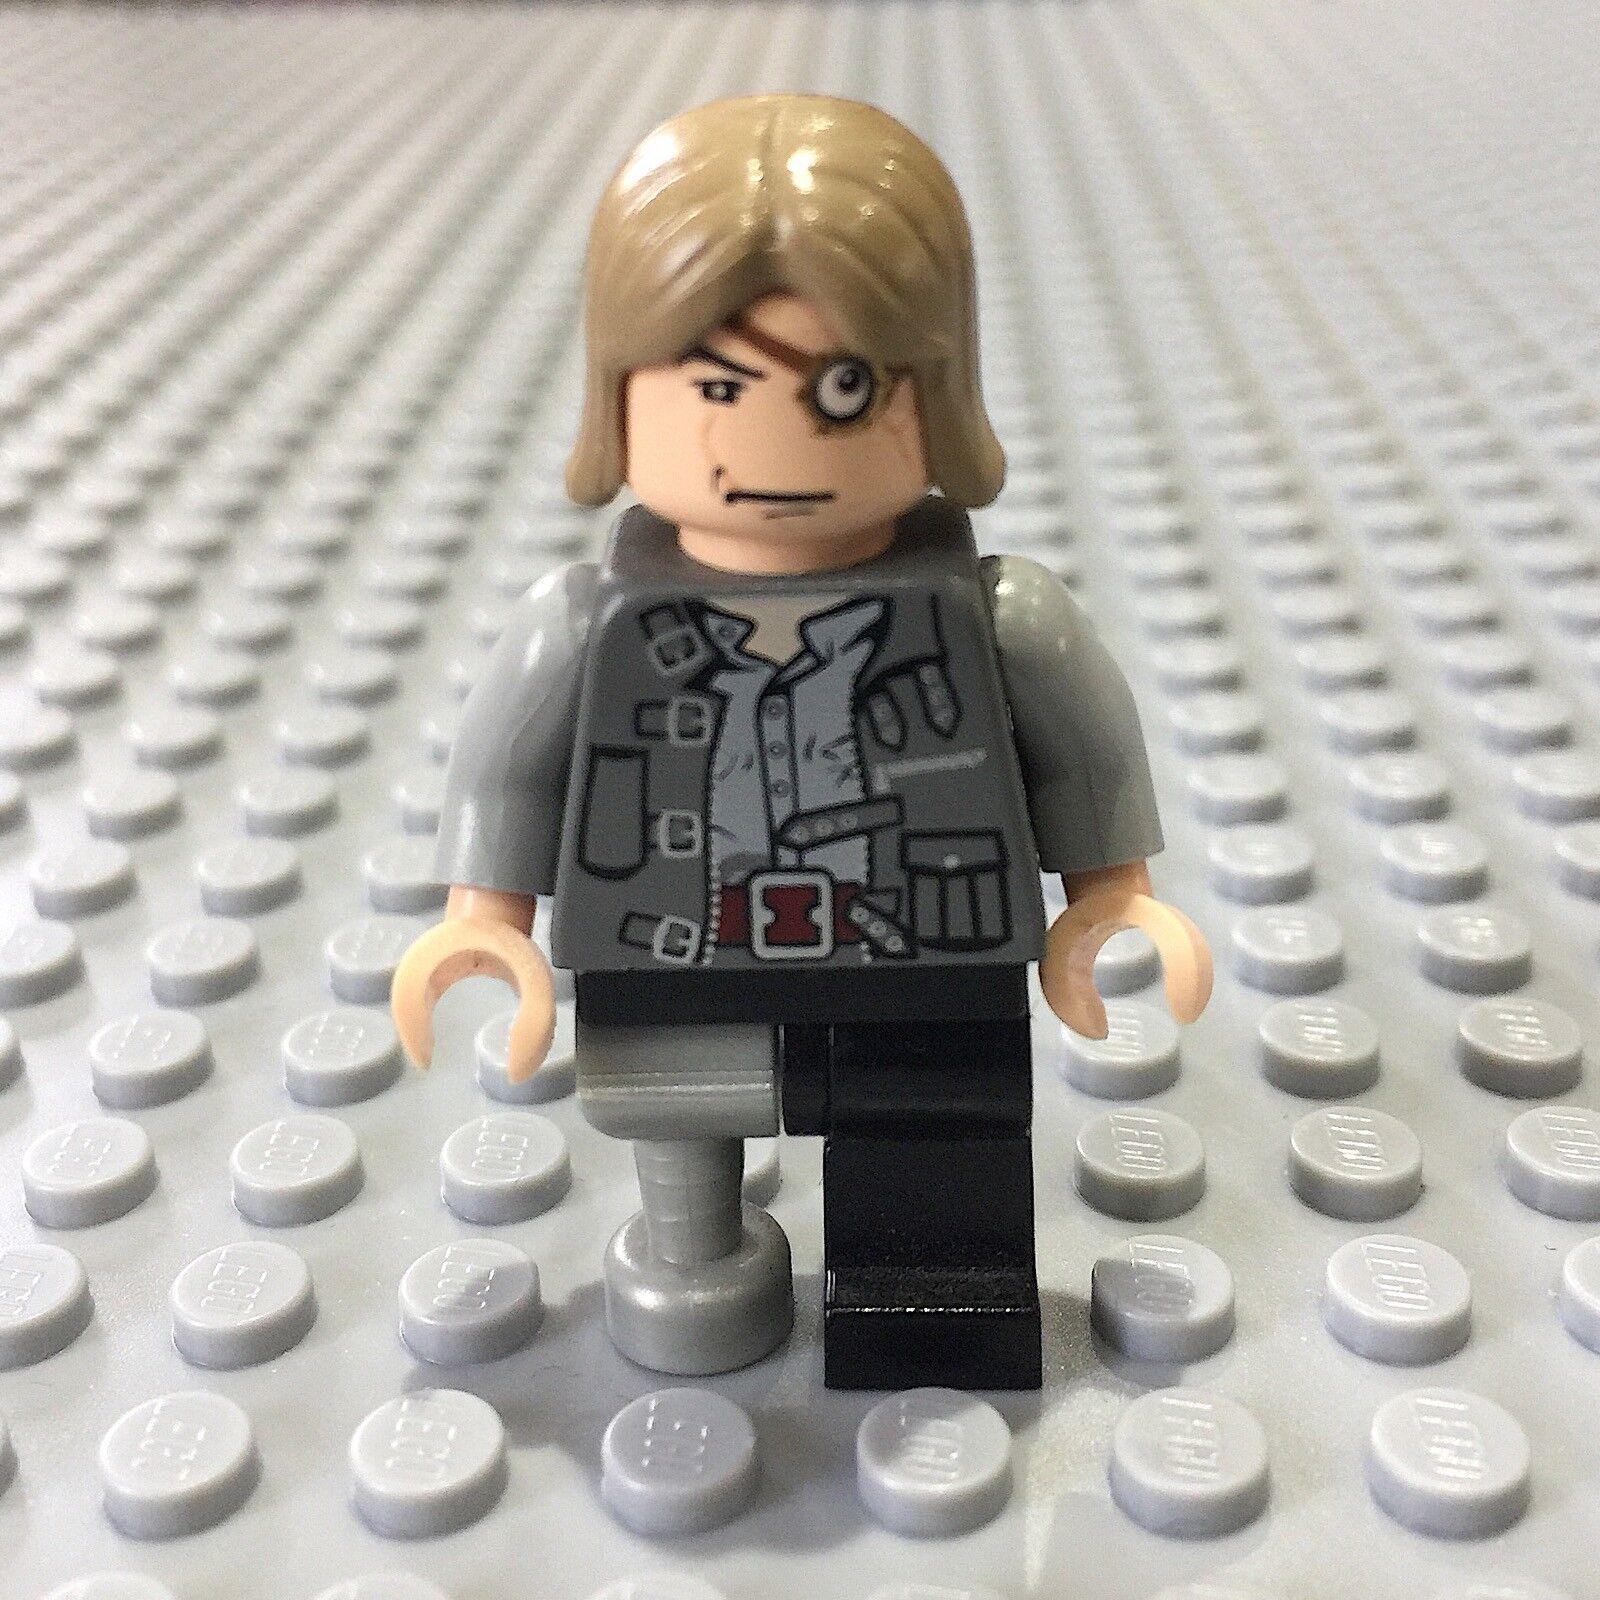 LEGO - Harry Potter - Professor Mad Eye Moody - hp070 - 4767.